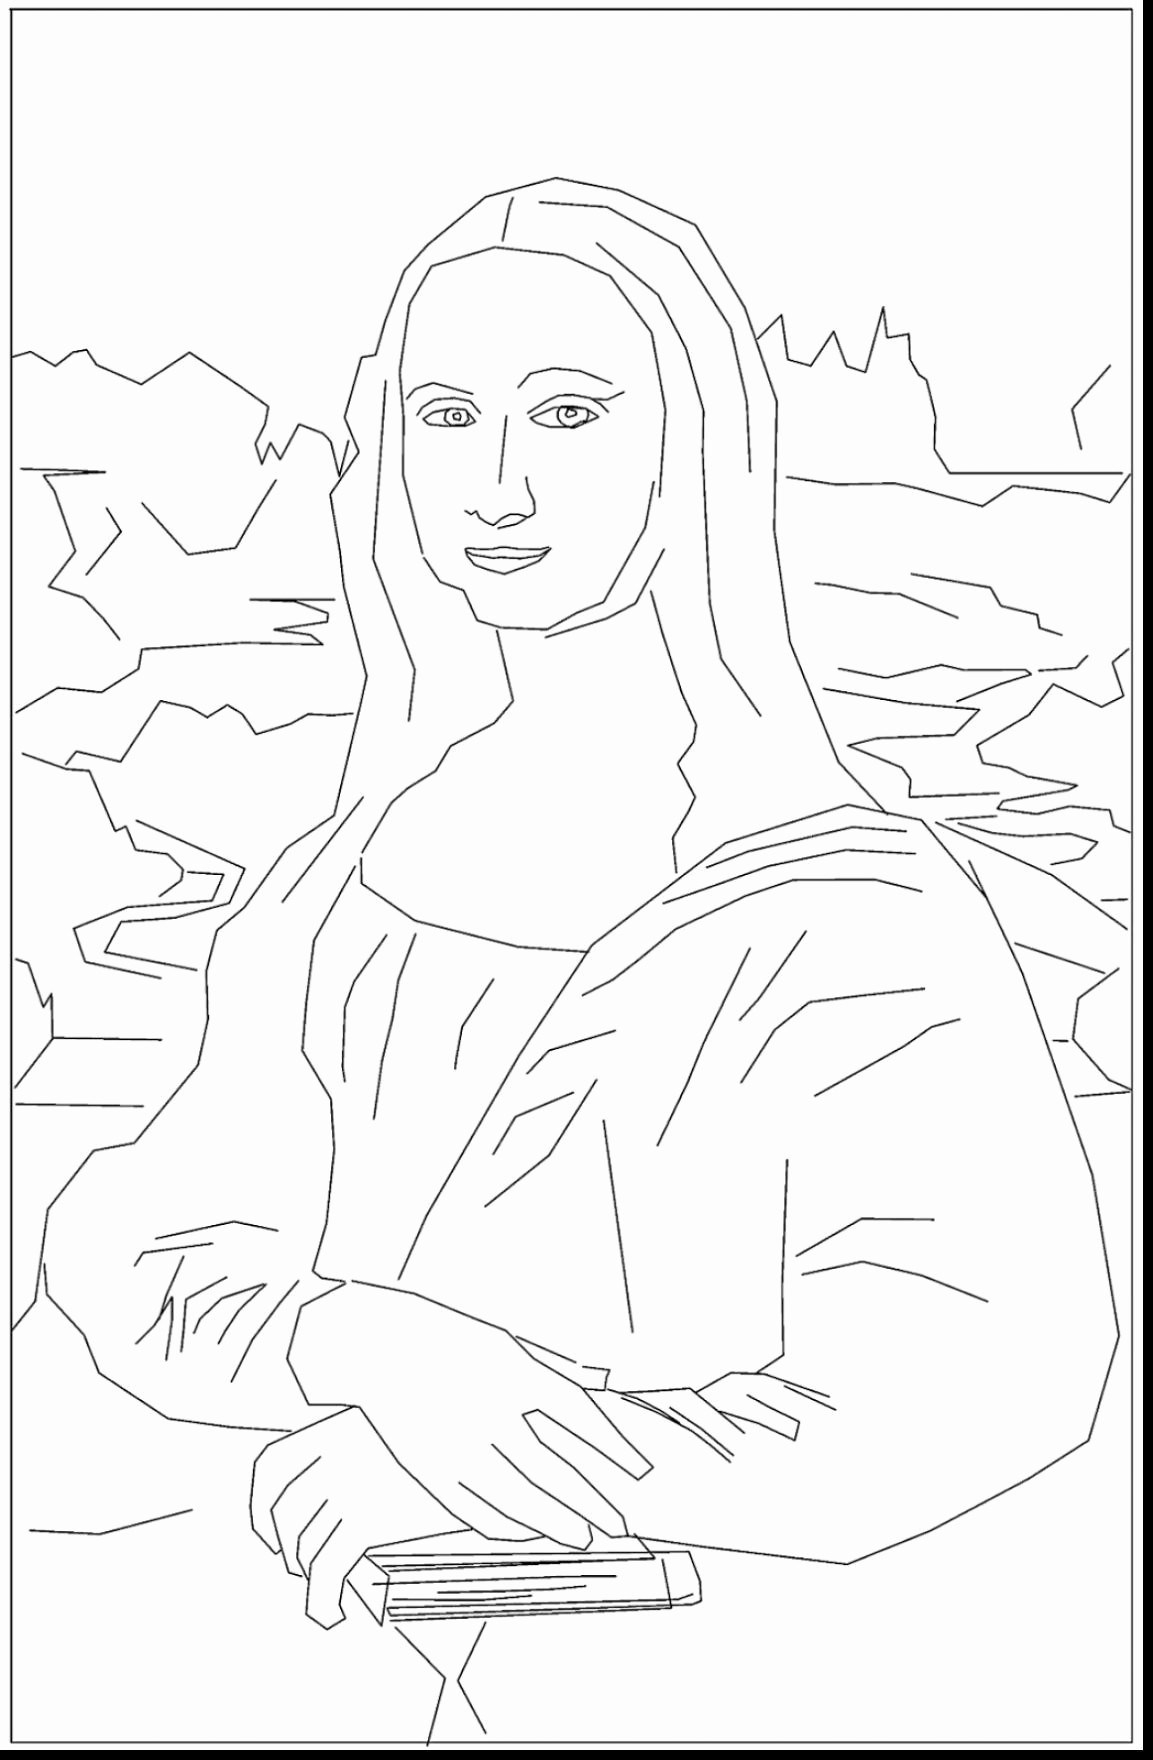 Leonardo Da Vinci The Last Supper Coloring Page Leonardo Da Vinci Coloring Pages Wiring Diagram Database